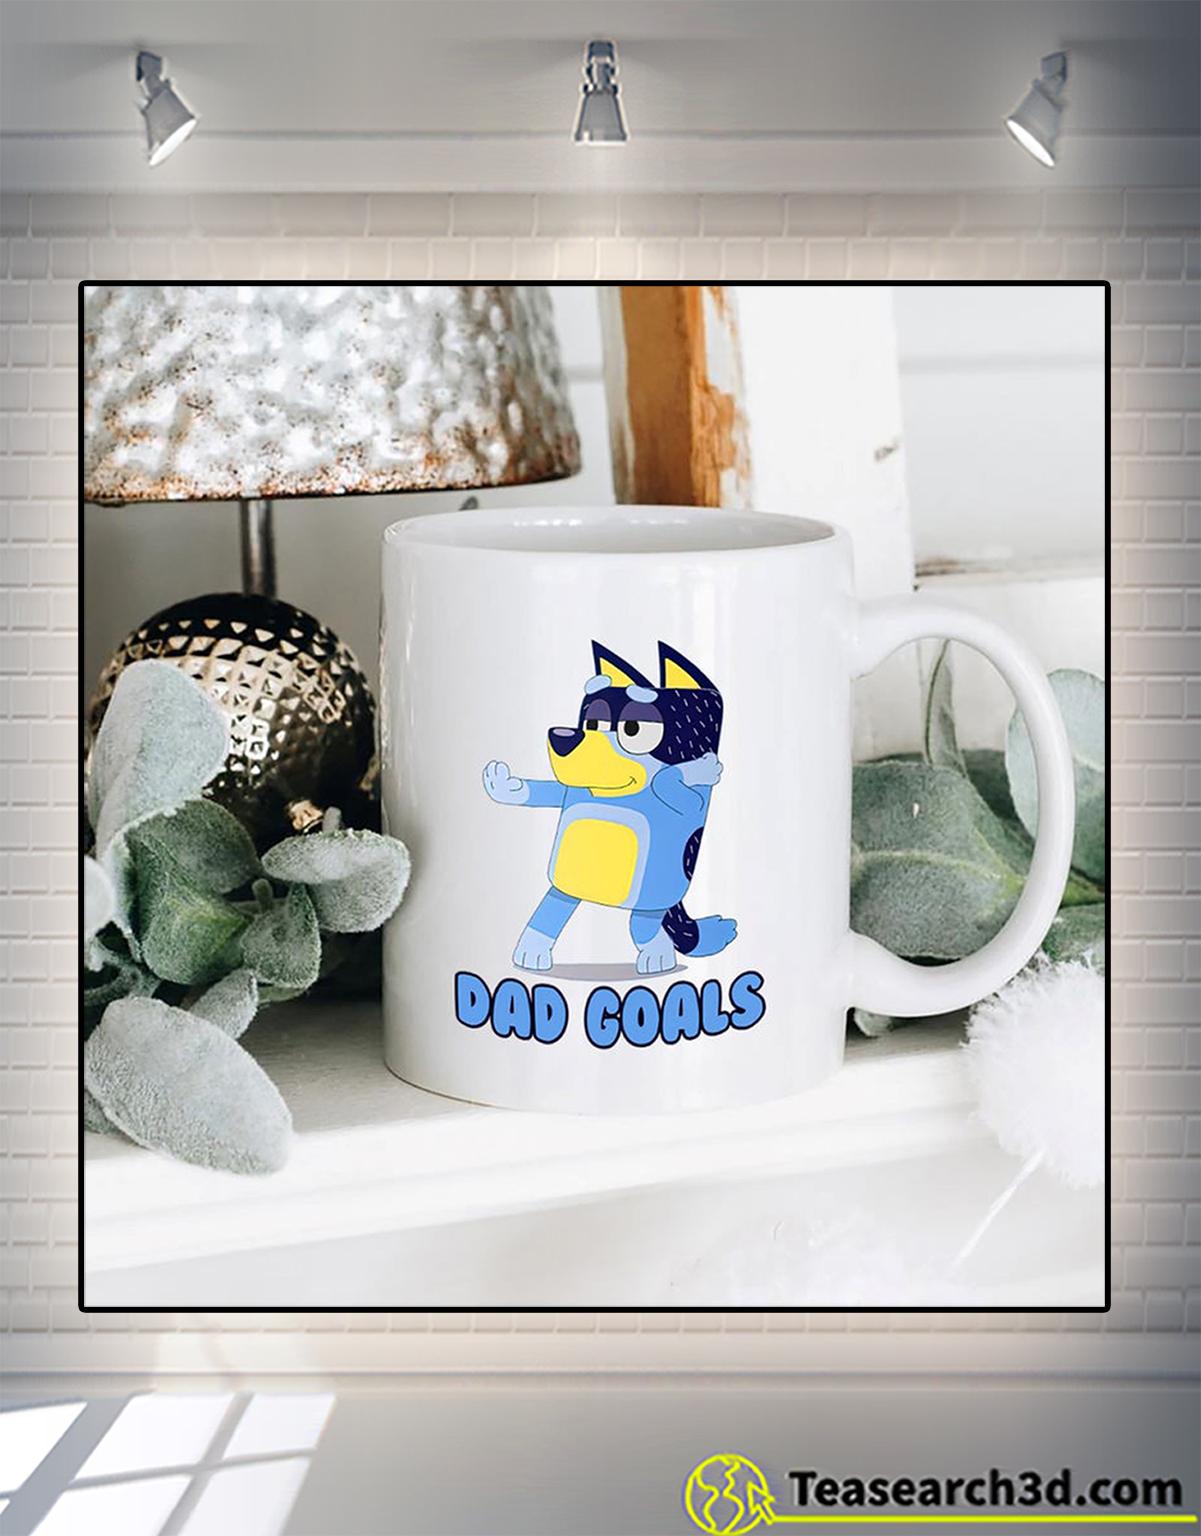 Bluey dad goals mug 2